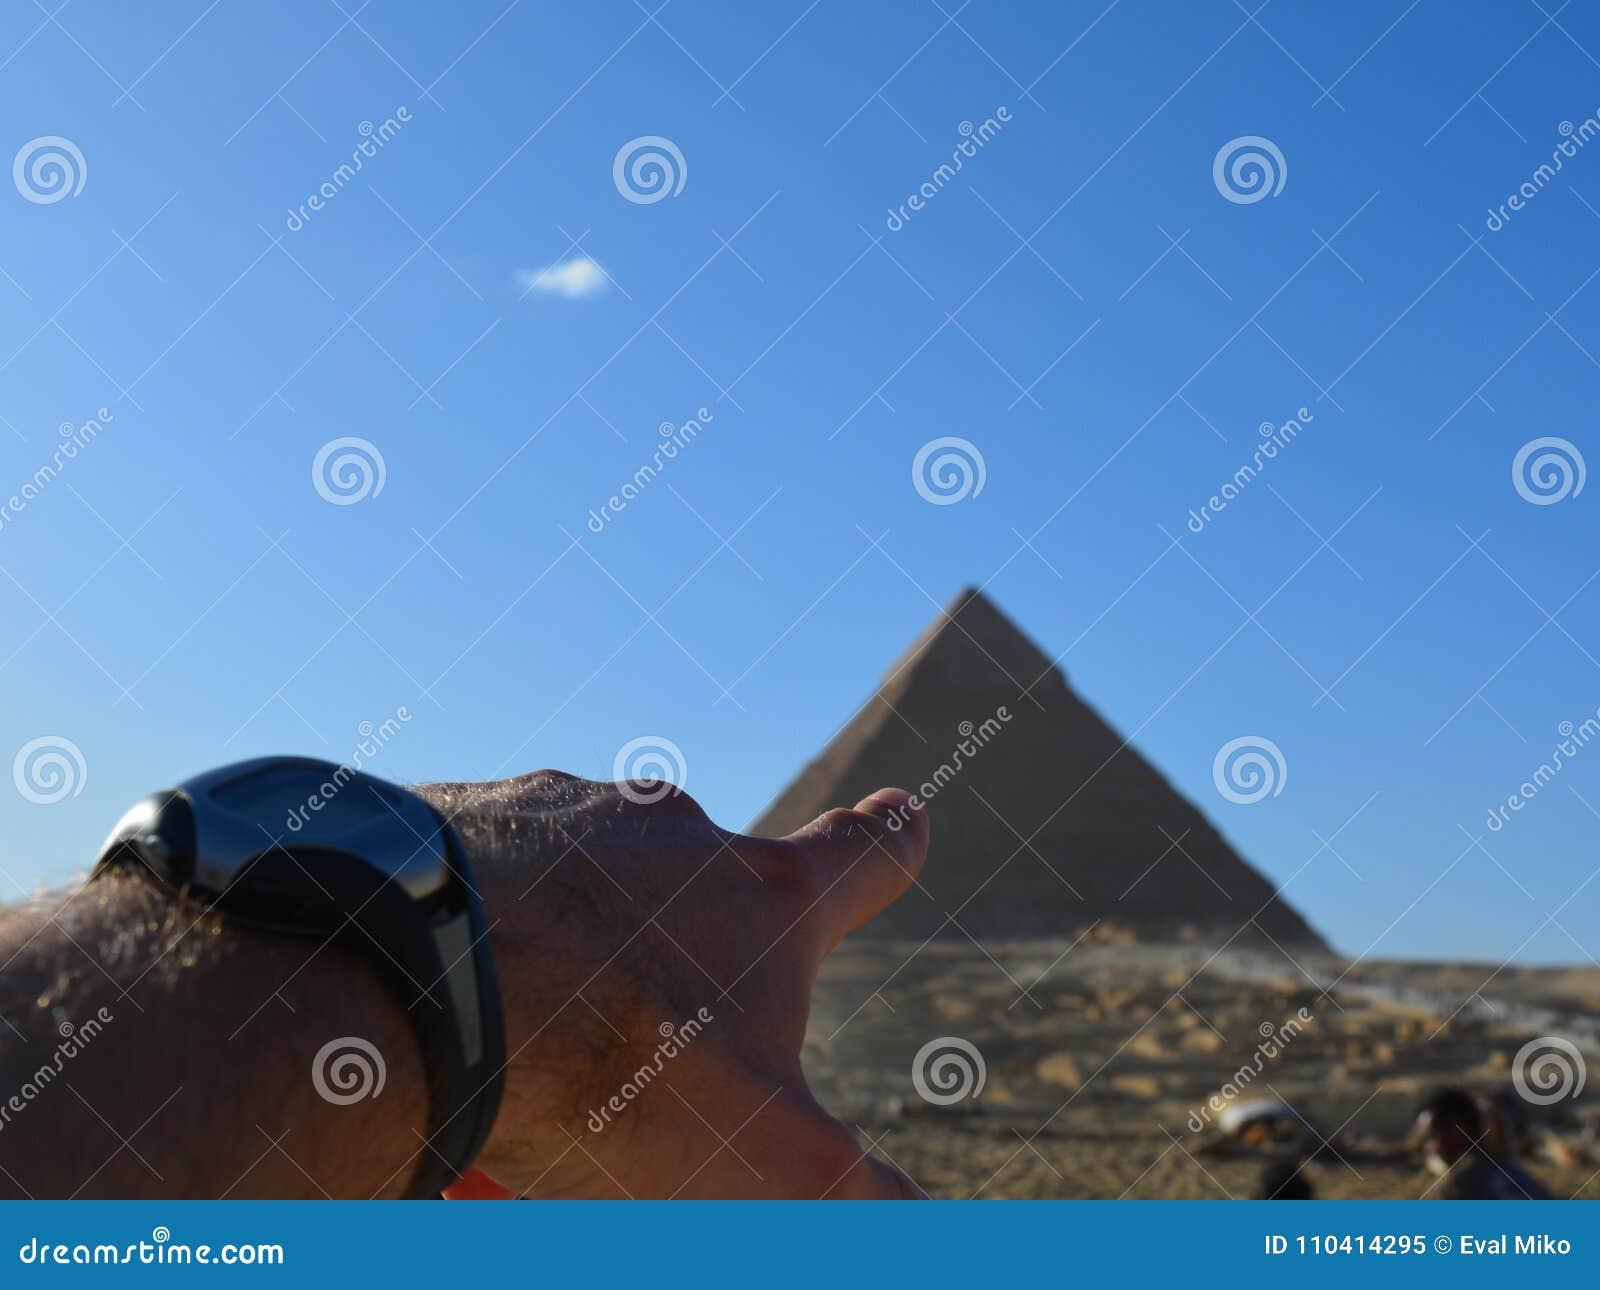 El punto del interés es pirámide egipcia